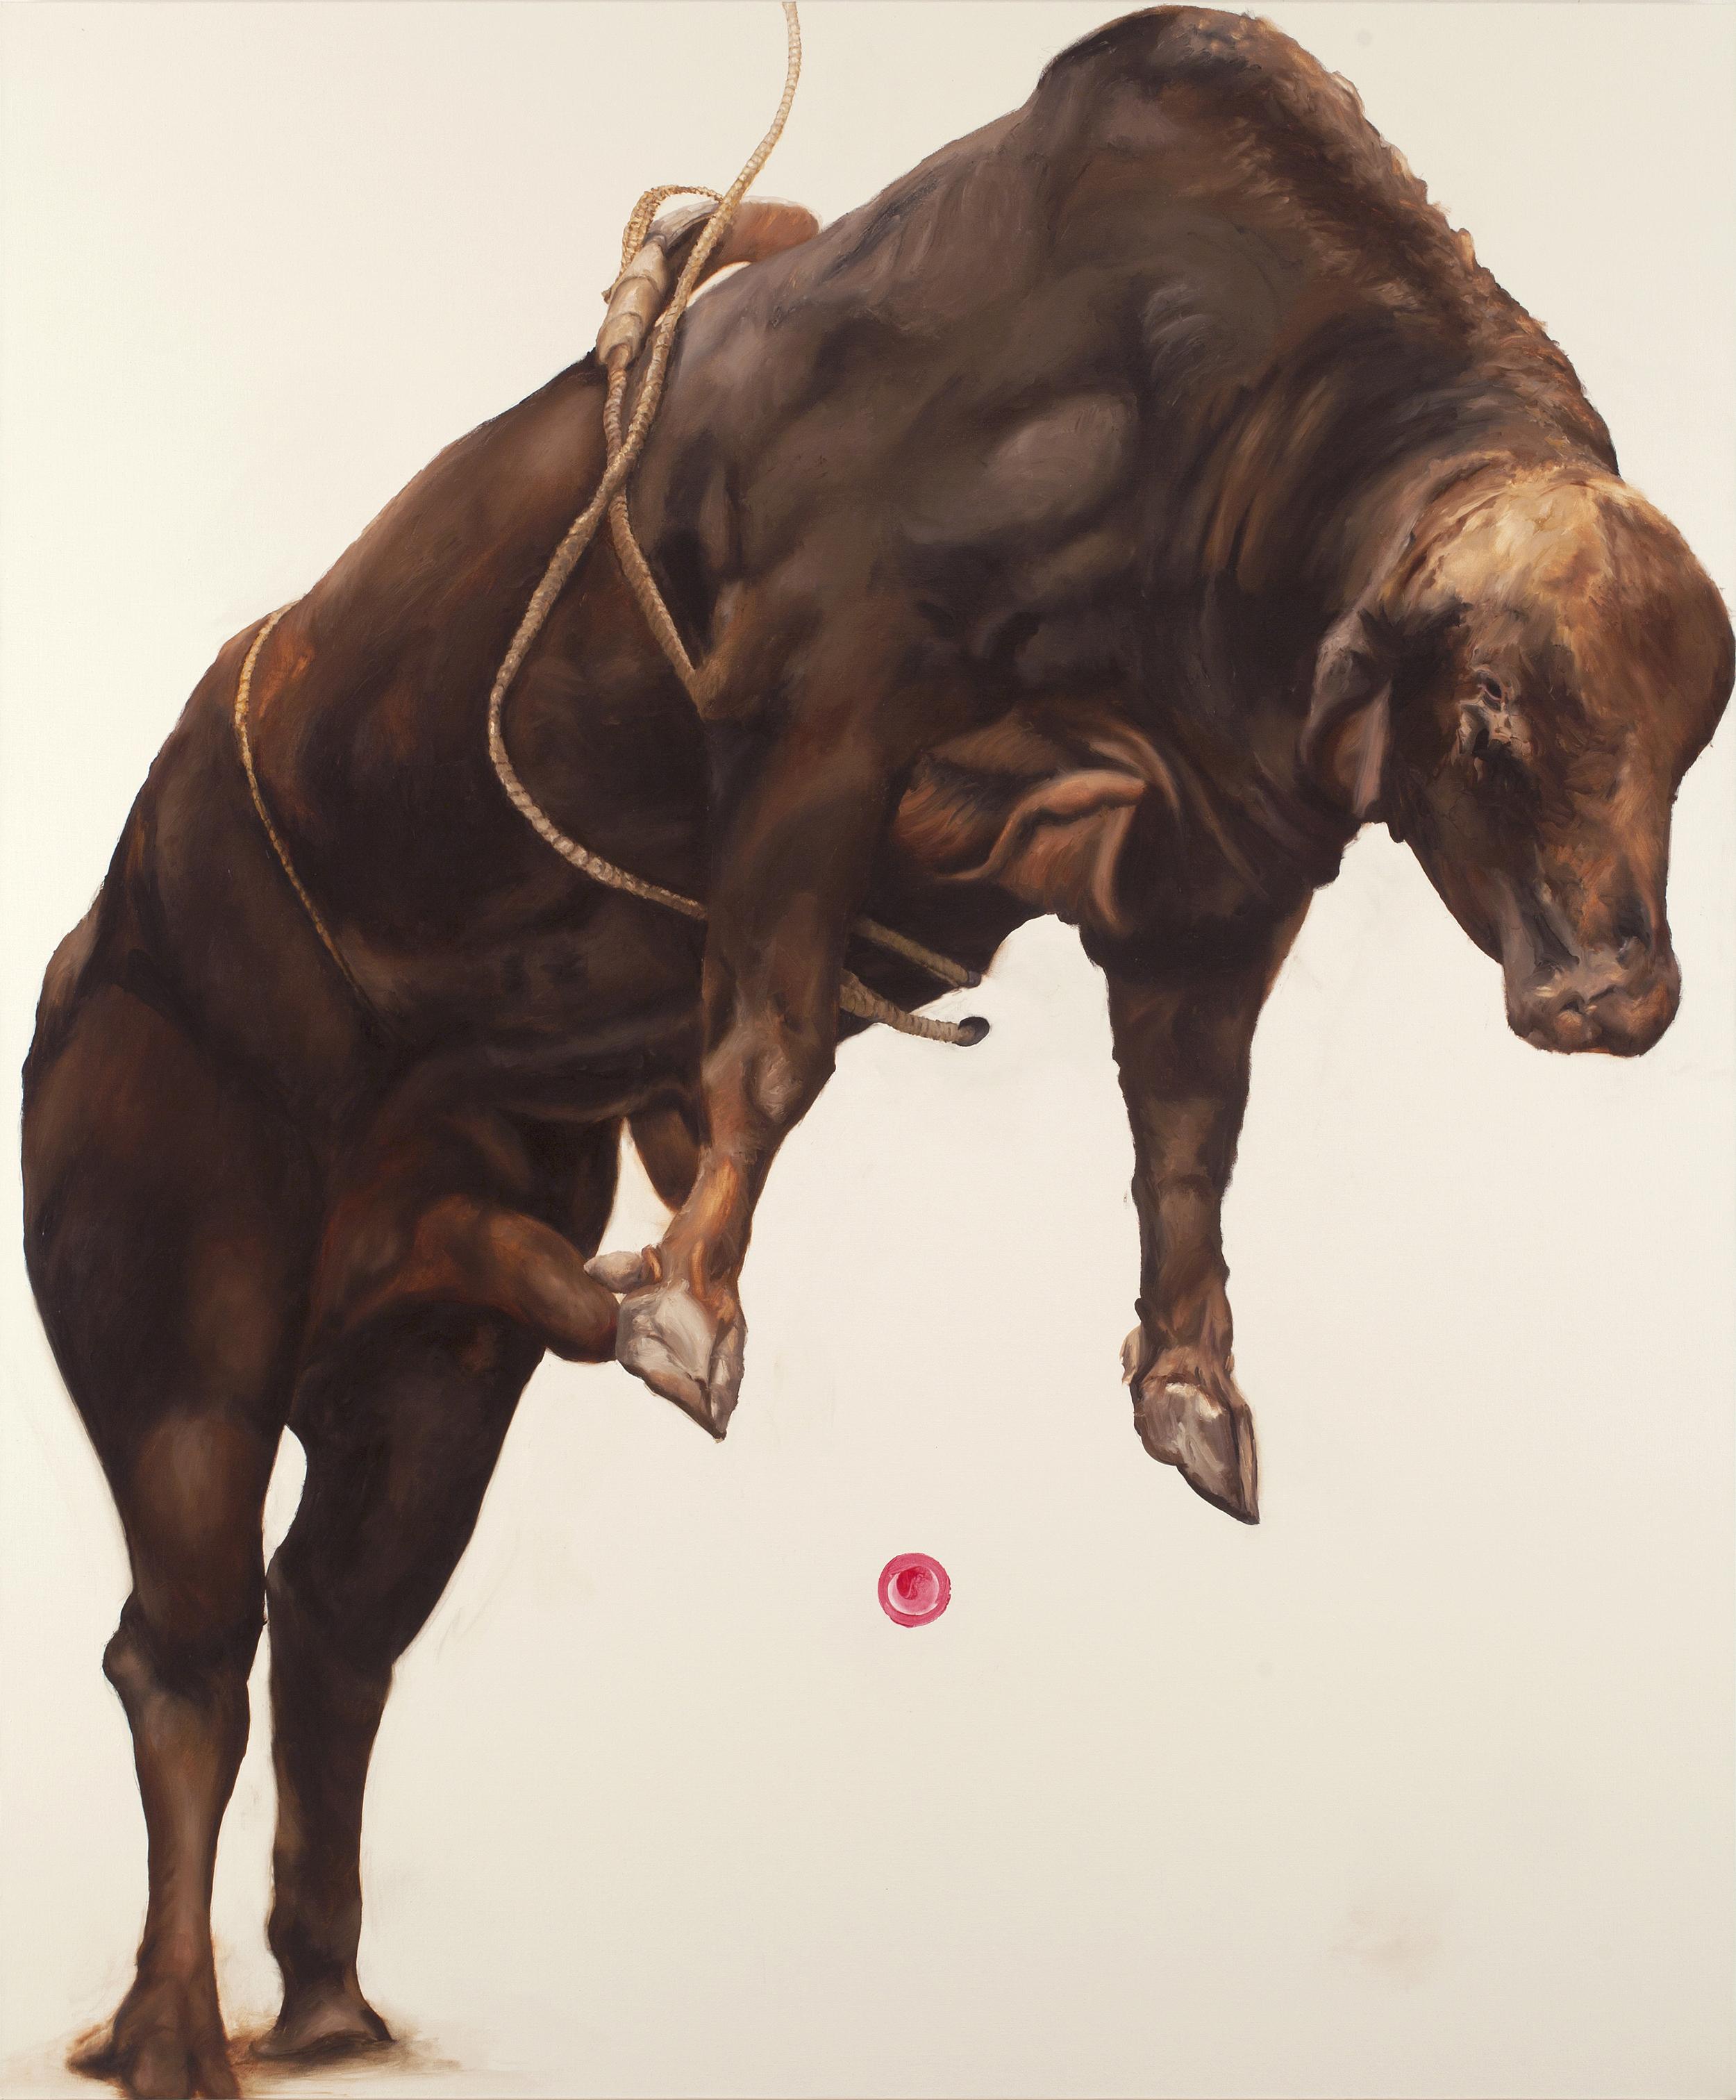 Bull and Emblem